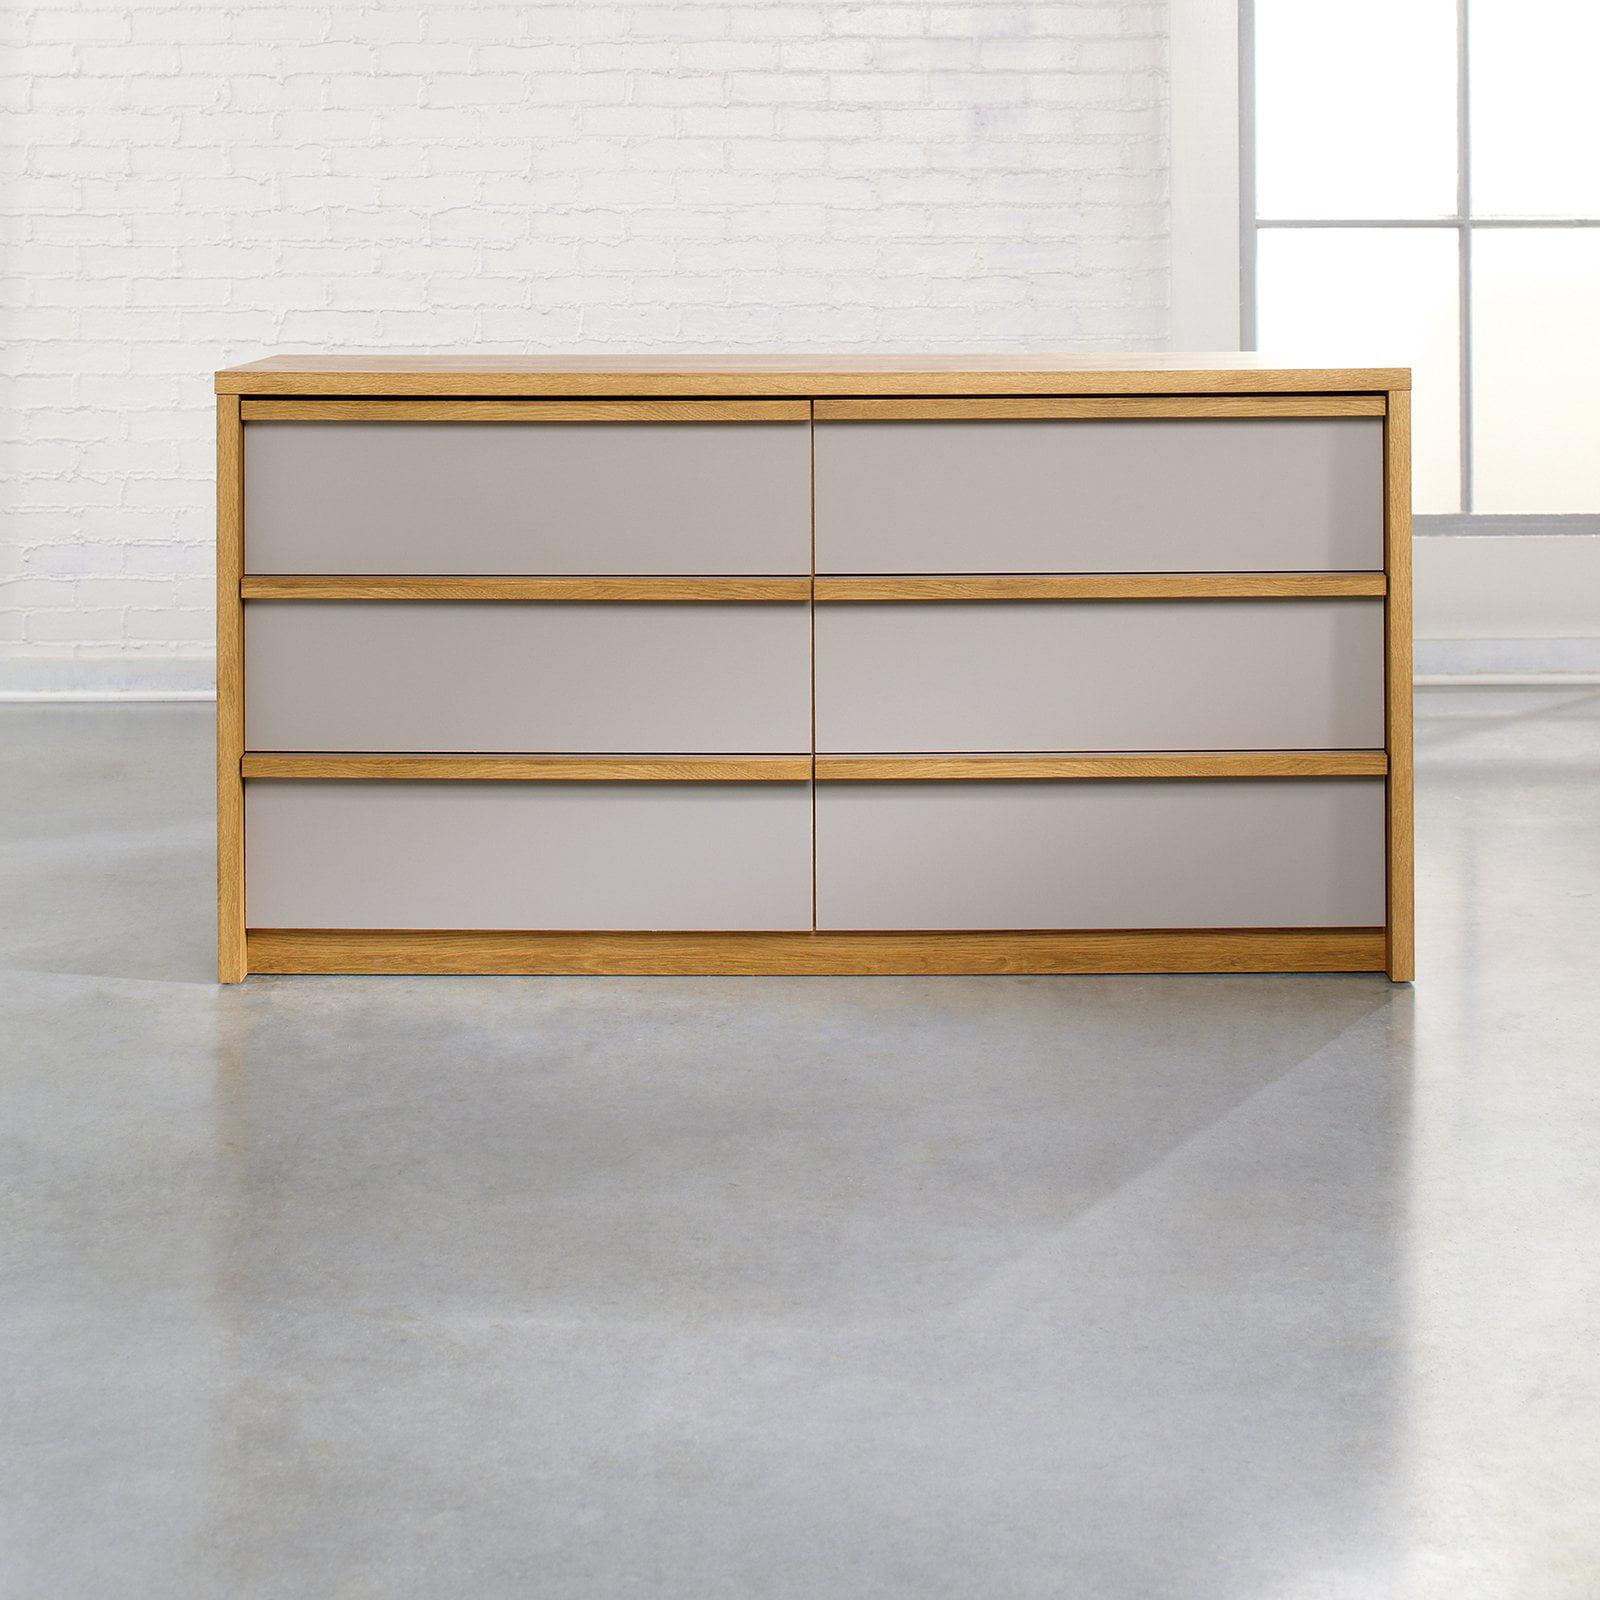 Soft Modern 6 Drawer Dresser - Pale Oak